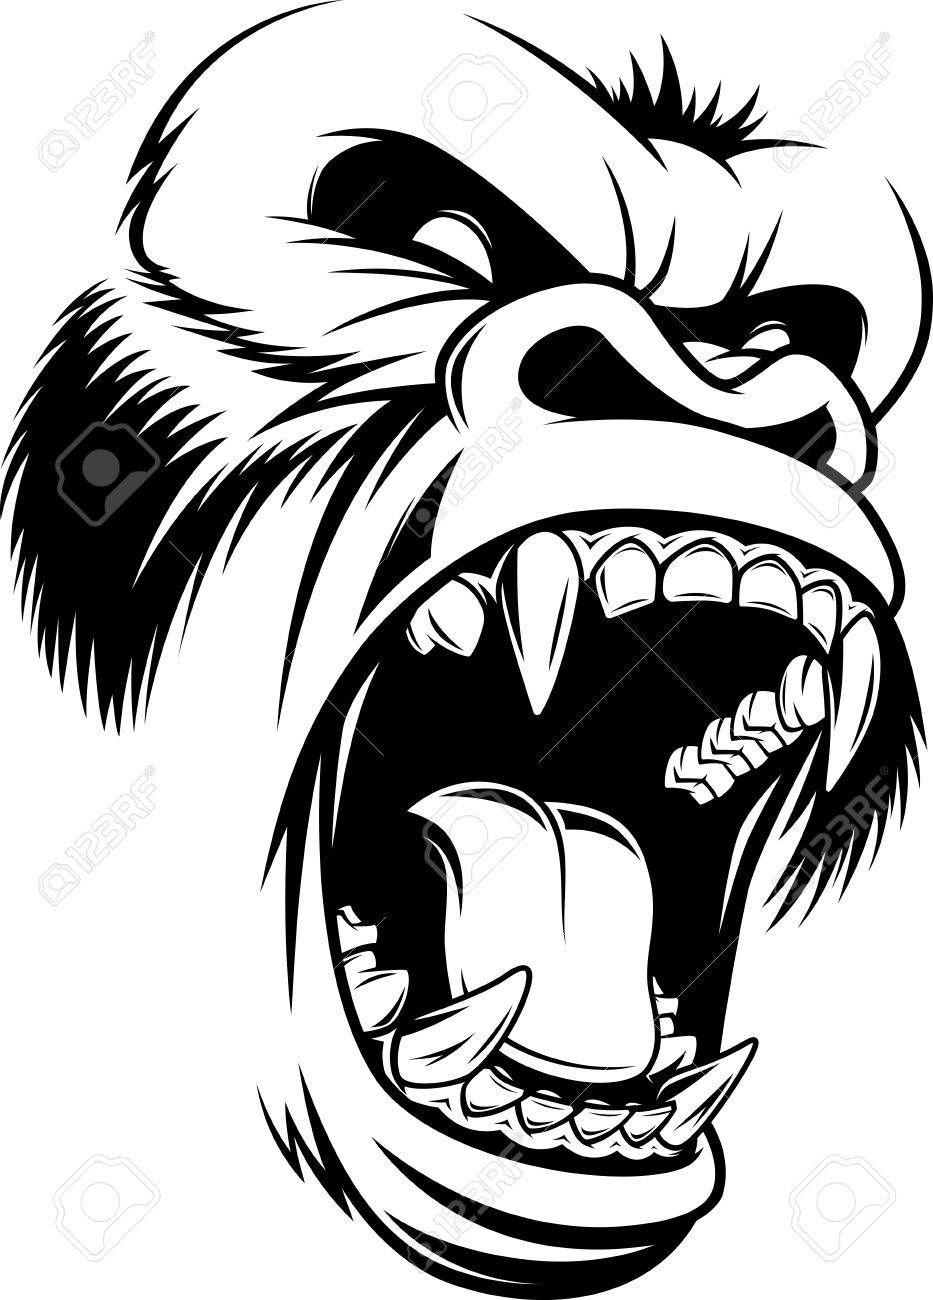 Illustration ferocious gorilla head on a white background картинки